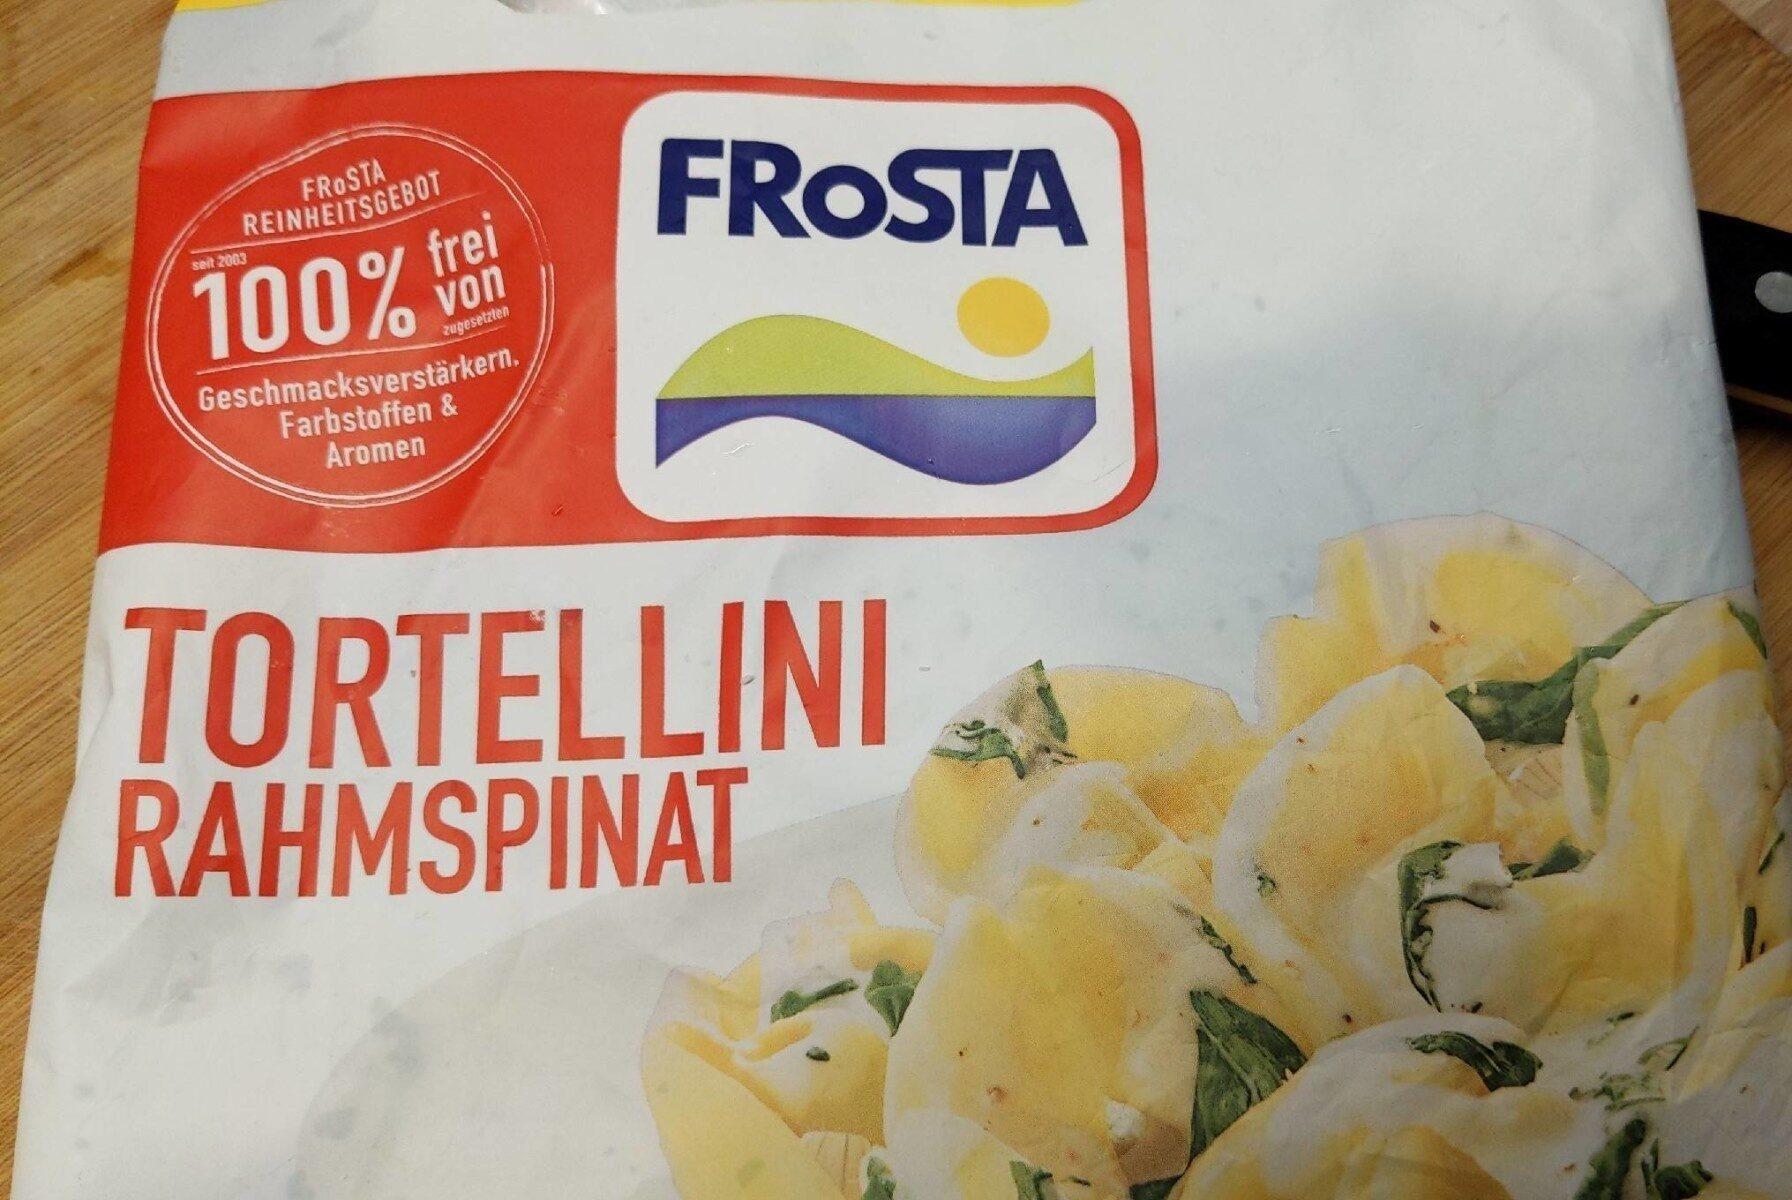 Frosta Tortellini rahmspinat - Produkt - en